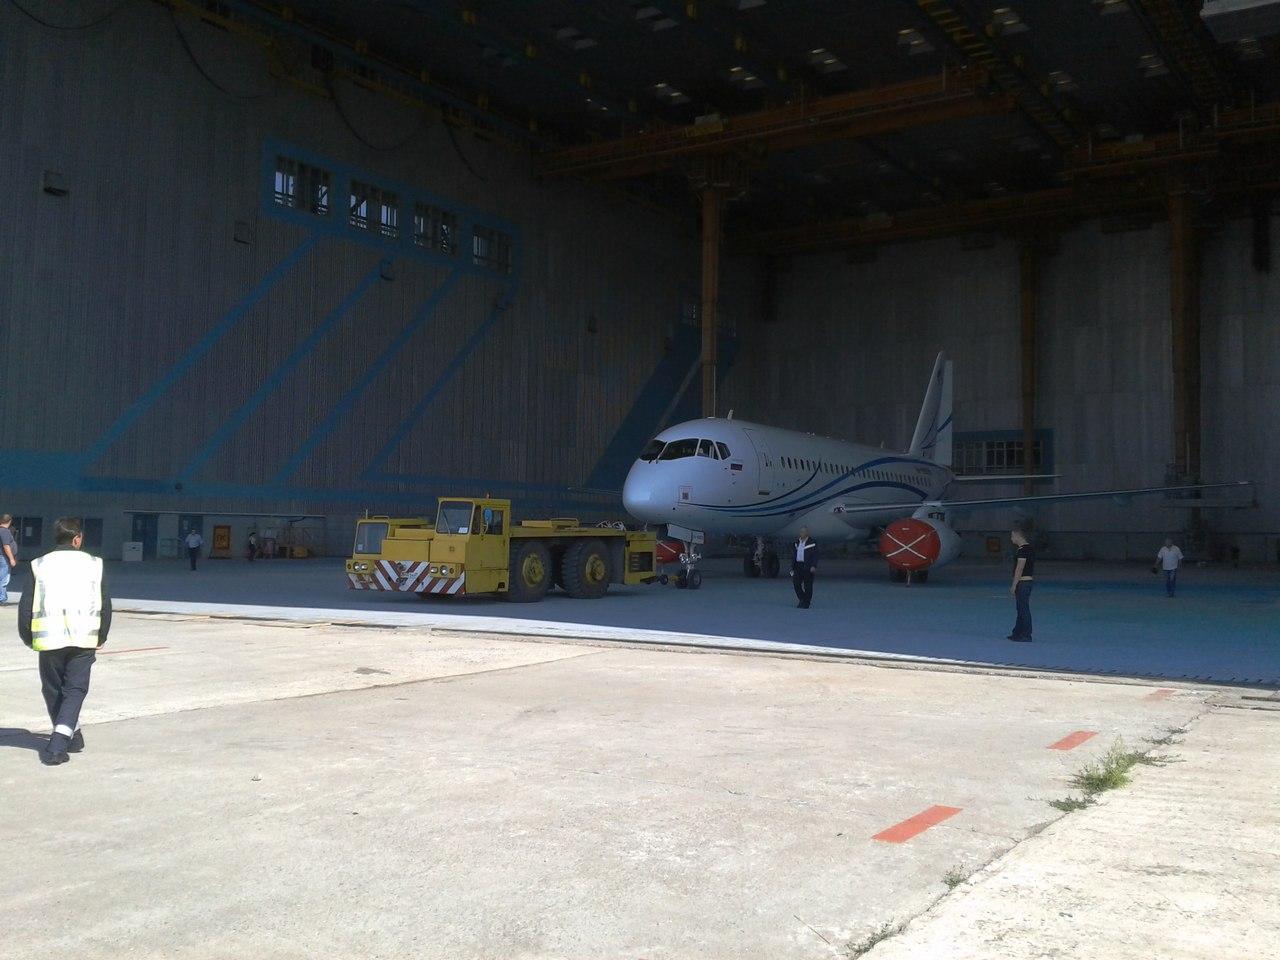 SSJ100_Gazpromavia_1.jpg